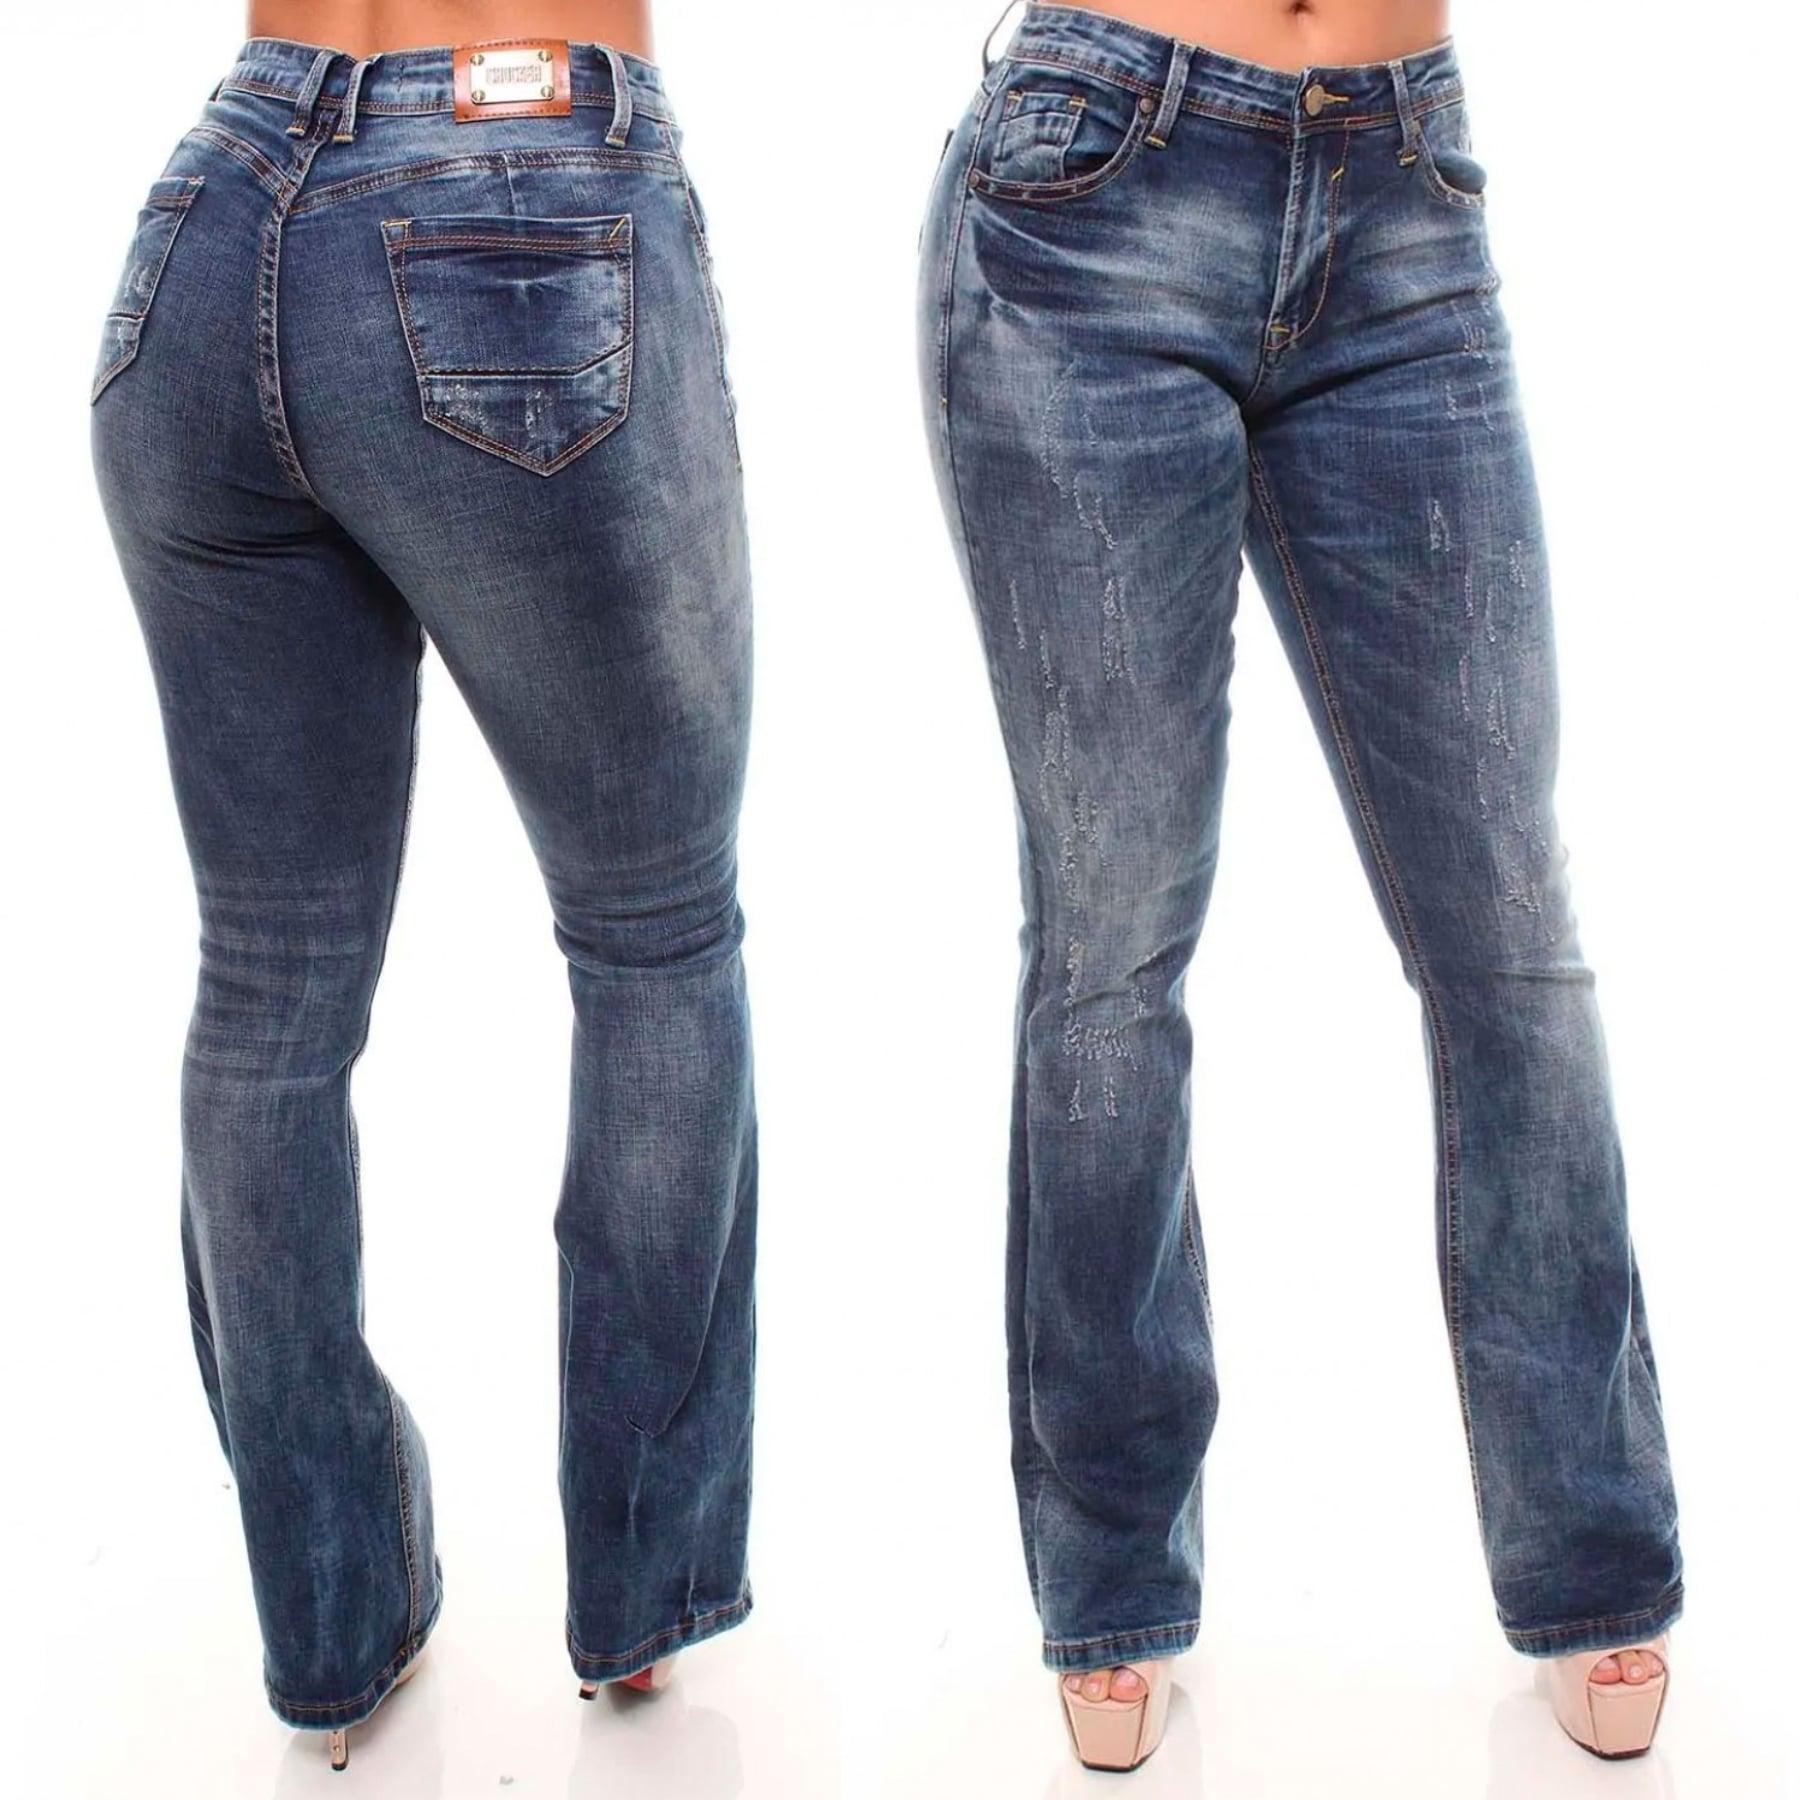 Calça Jeans Feminina Flare Cor Jeans Escuro Crocker